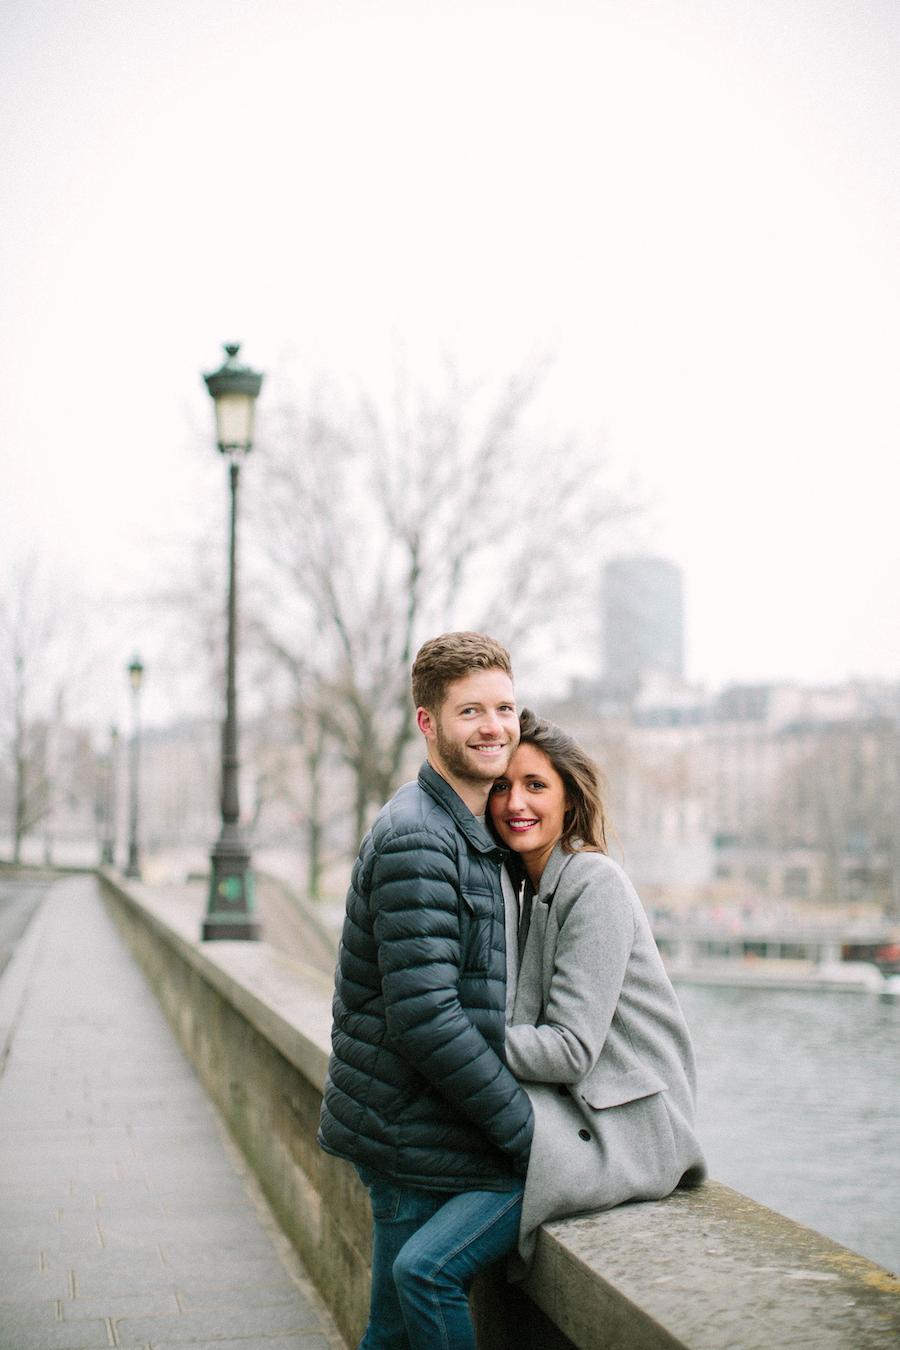 saya-photography-pre-wedding-couple-engagement-paris-quartier-latin-36.jpg